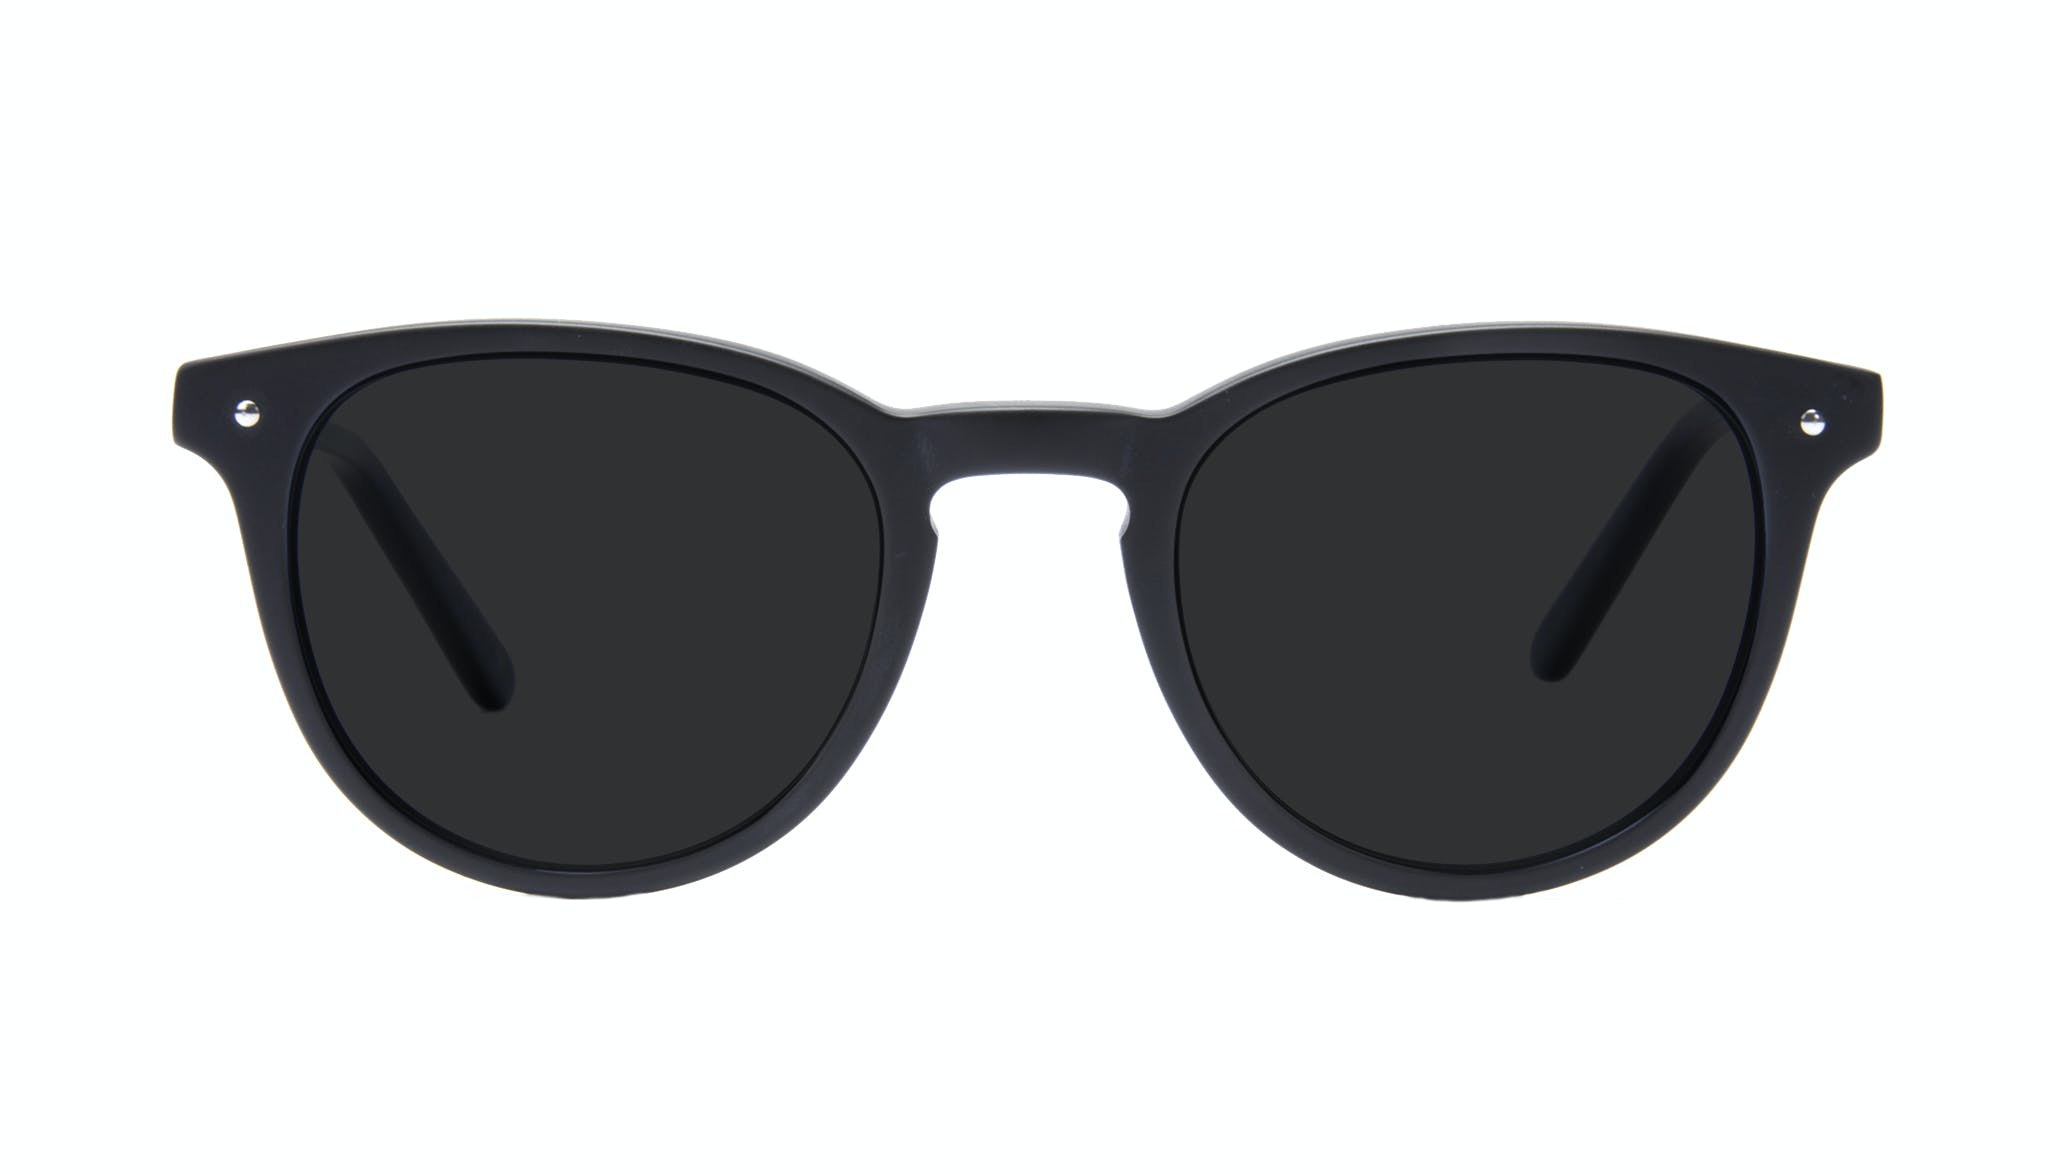 Affordable Fashion Glasses Round Sunglasses Men Cult Matte Black Front